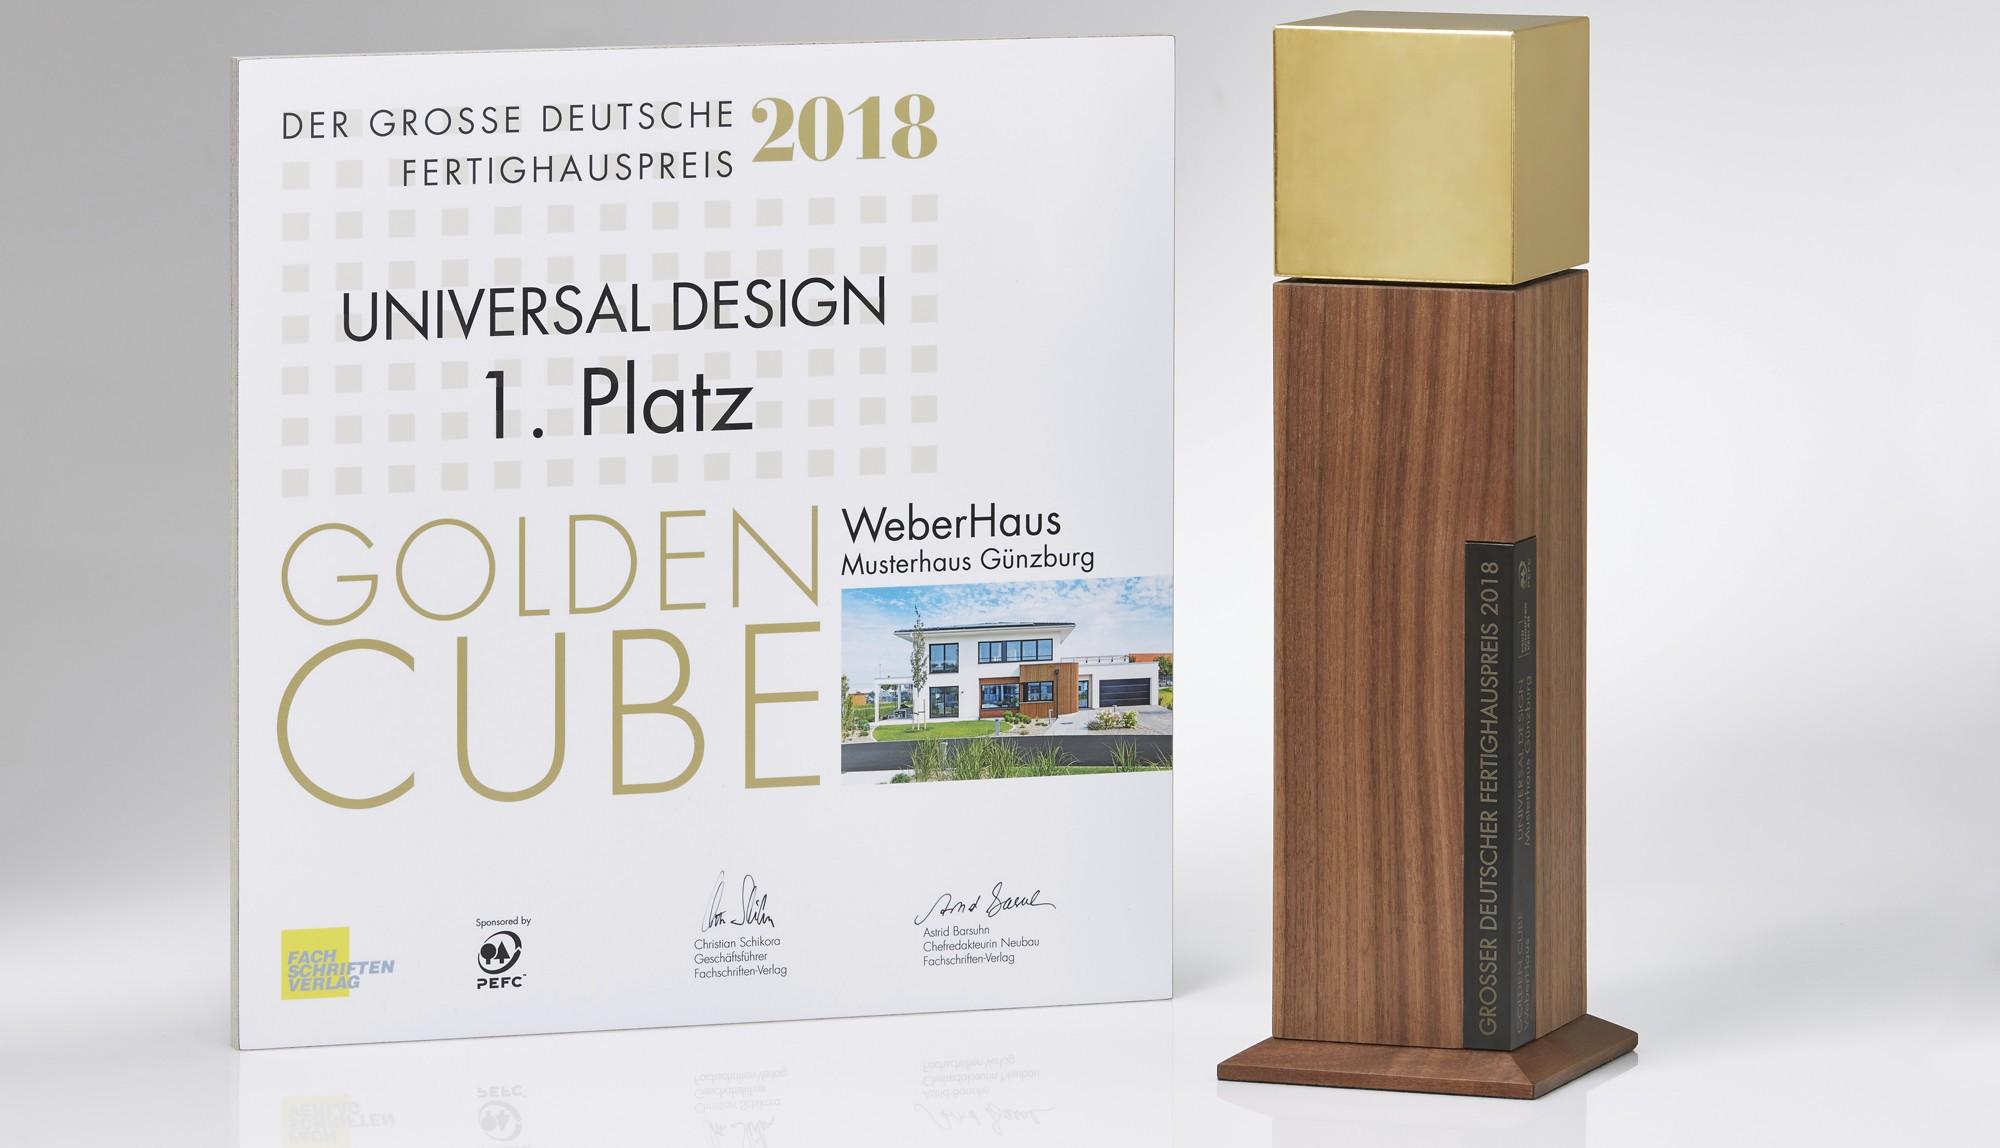 WeberHaus - Moderne Stadtvilla setzt neue Maßstäbe